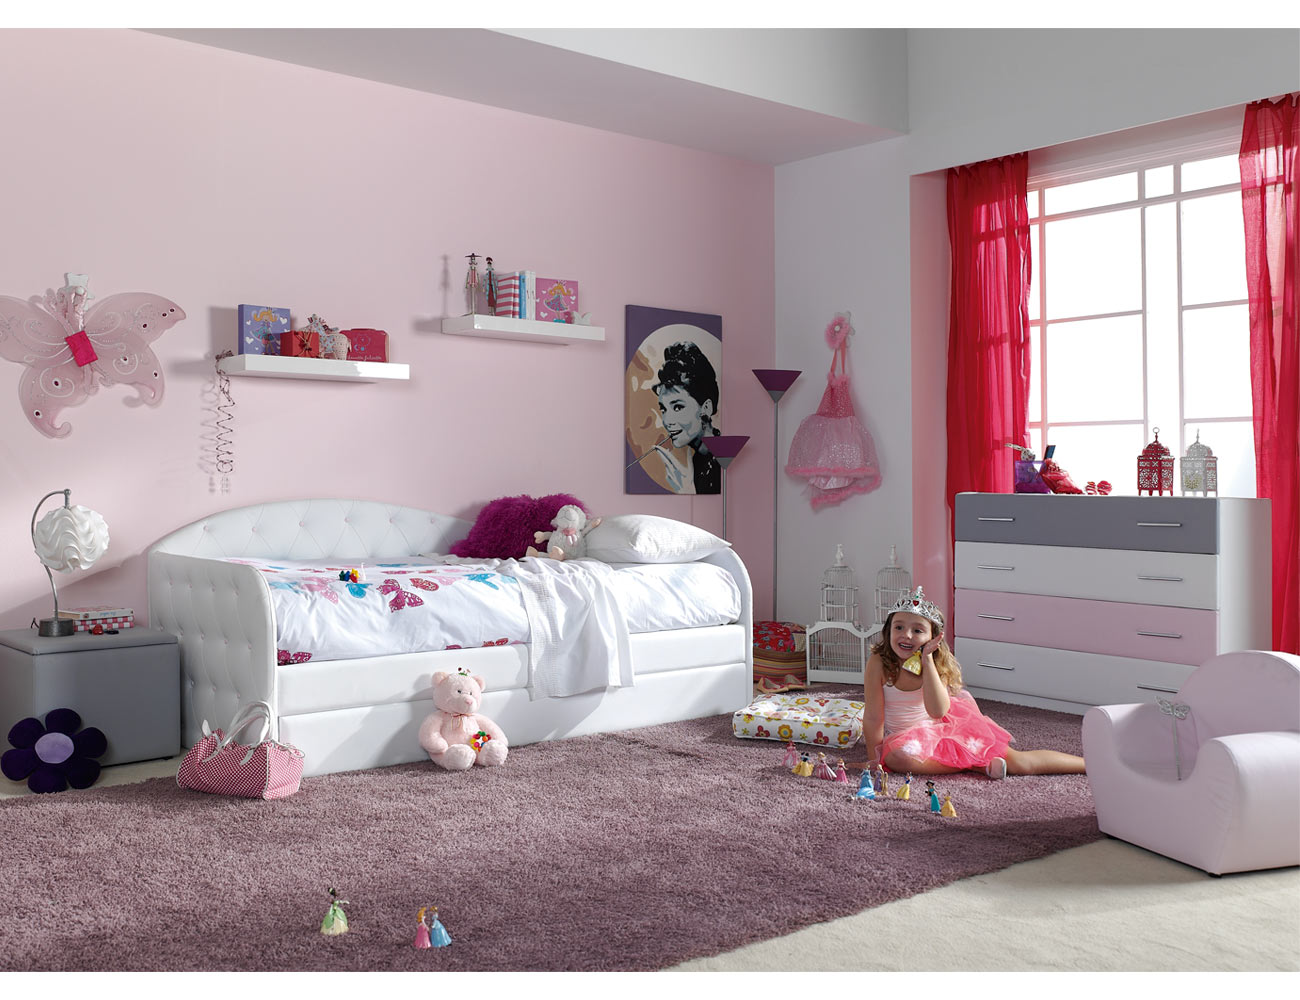 243 cama nido8